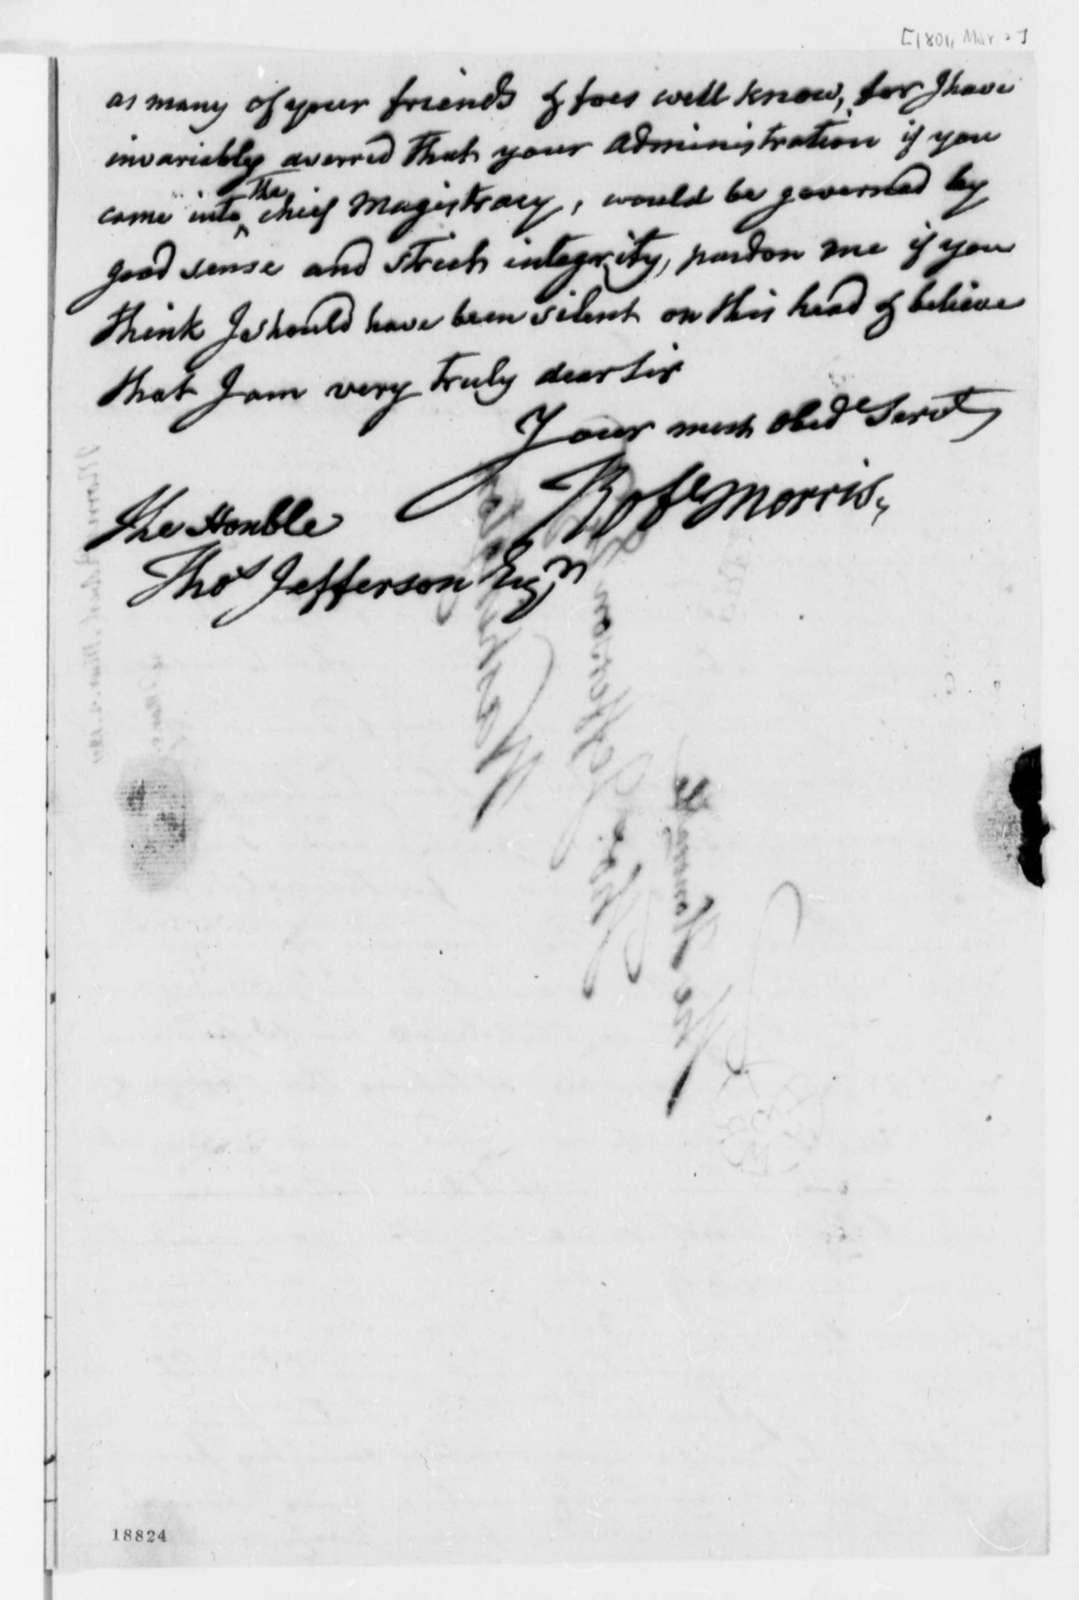 Robert Morris to Thomas Jefferson, March 2, 1801